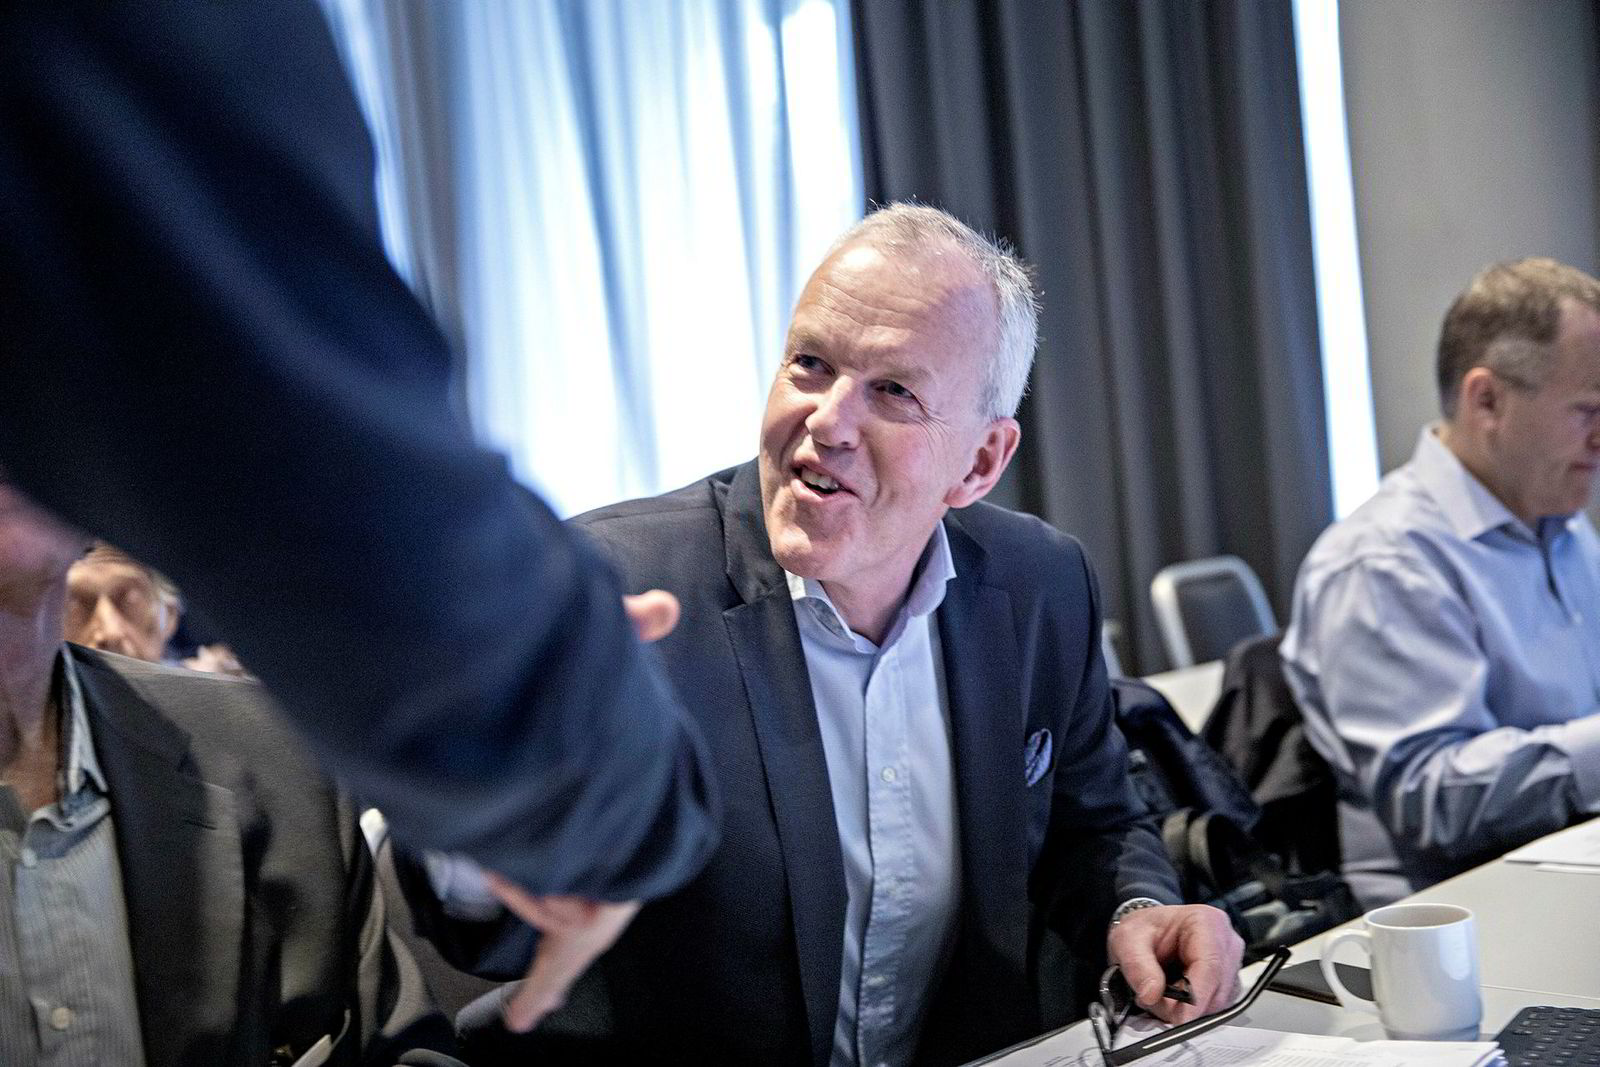 Direktør Ole-Wilhelm Meyer i Opplysningsvesenets fond